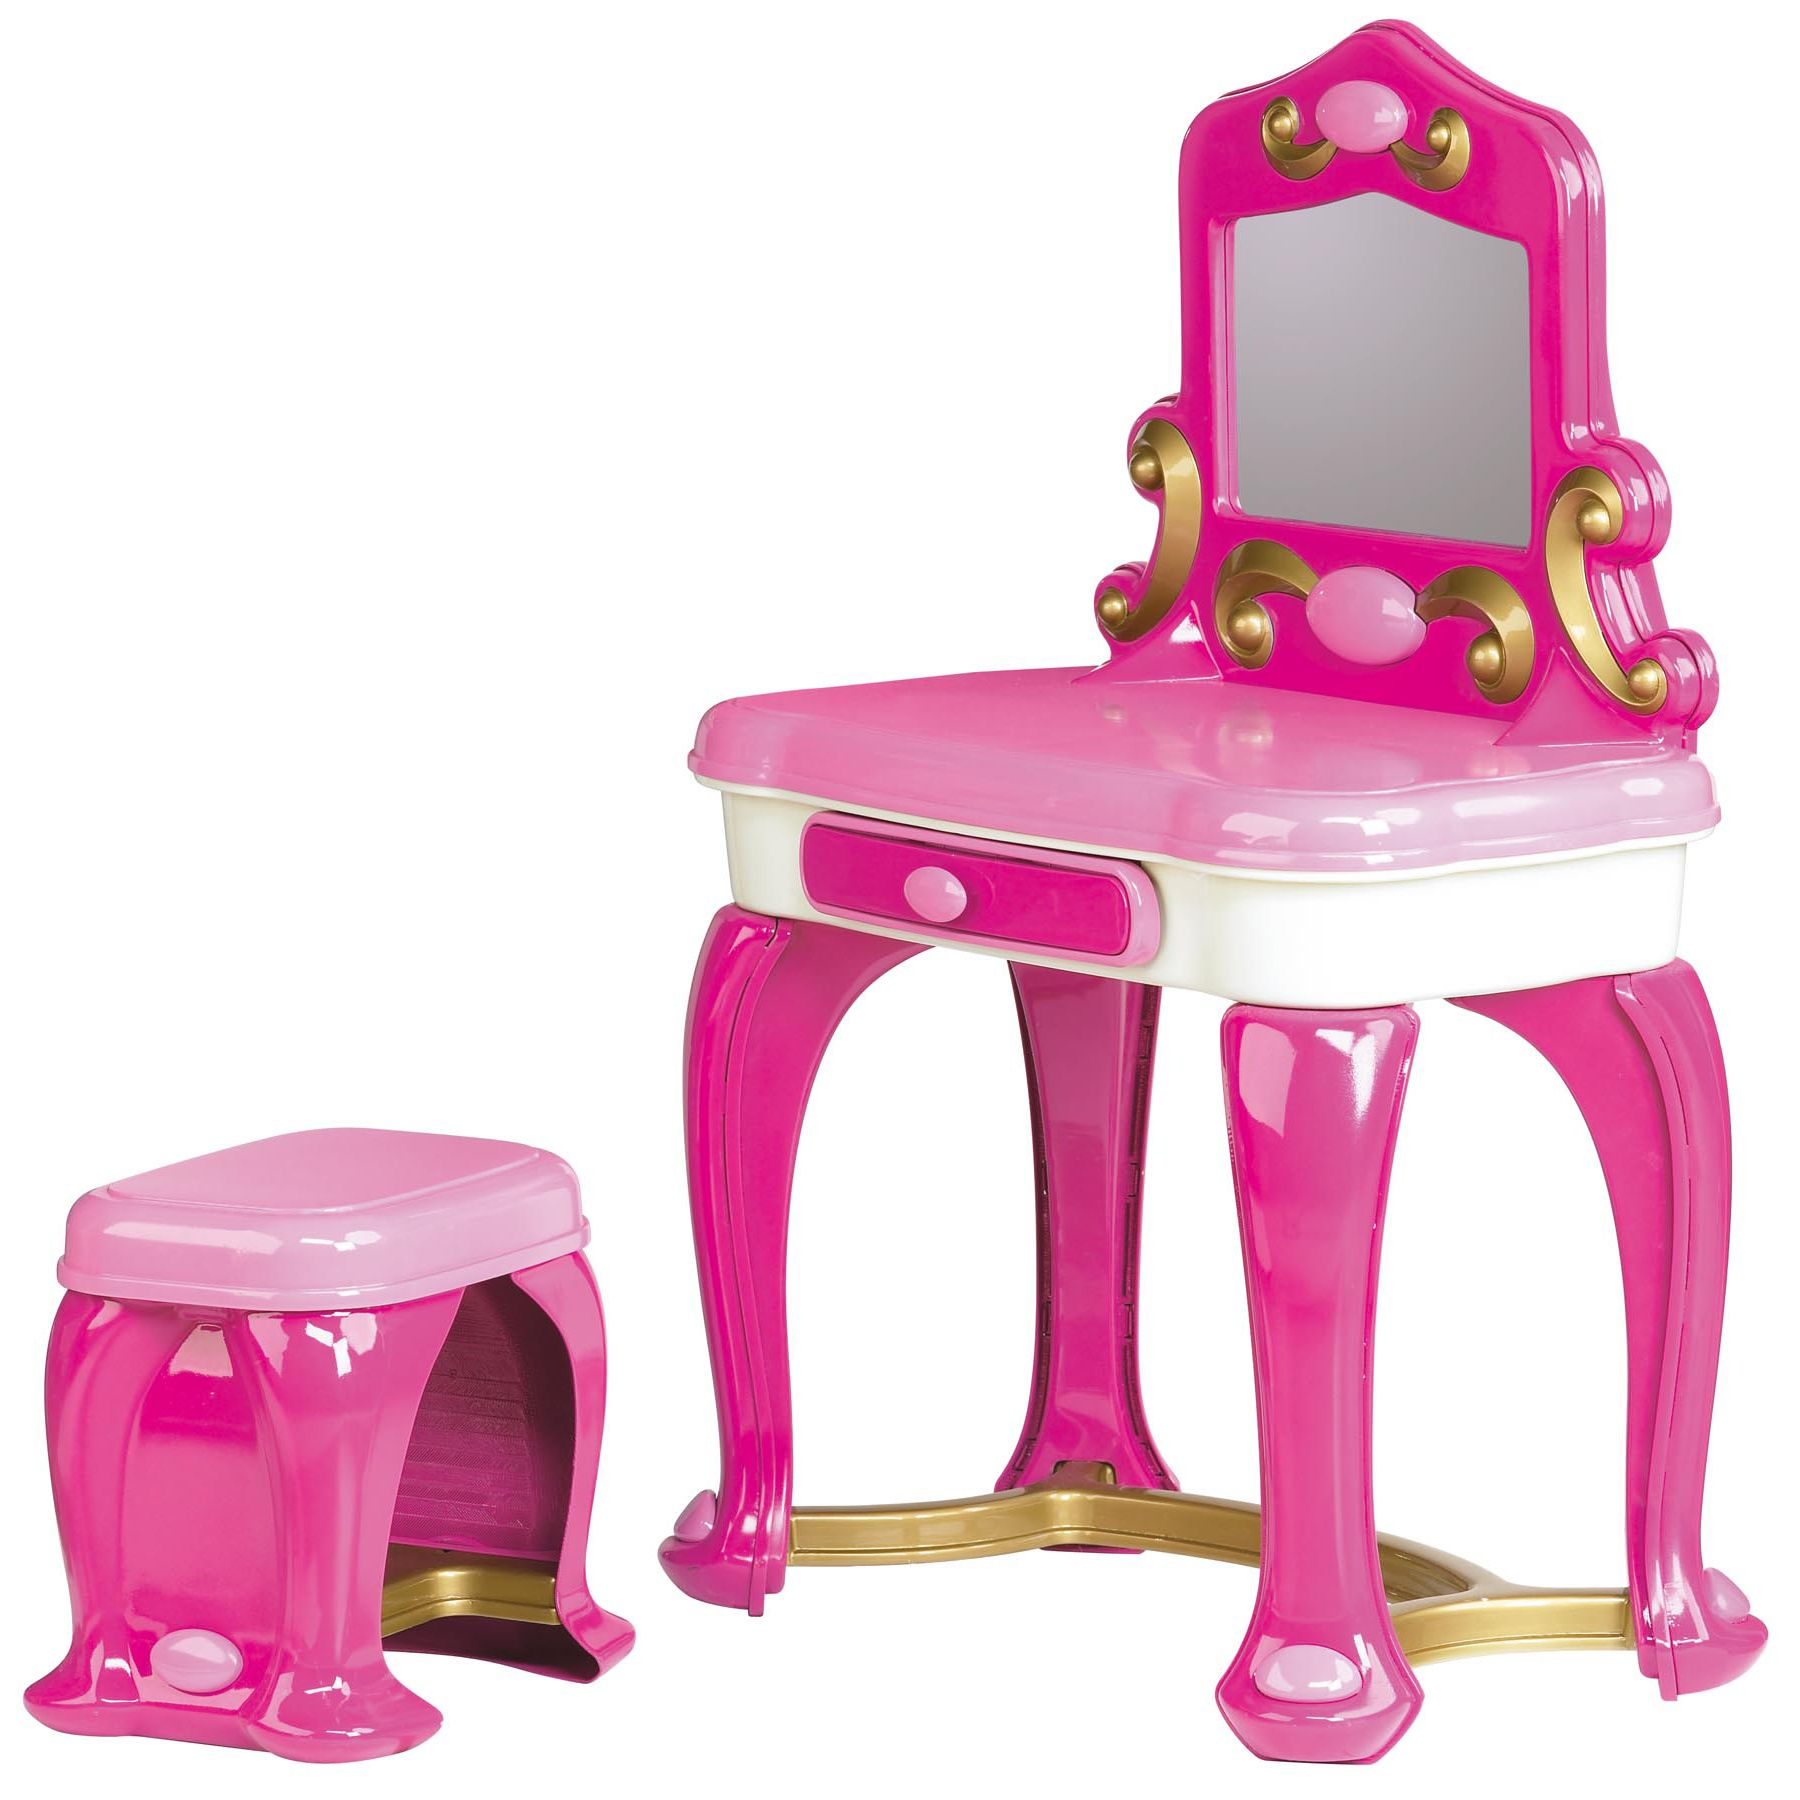 purple makeup vanity chair cane seat repair american plastic toys deluxe